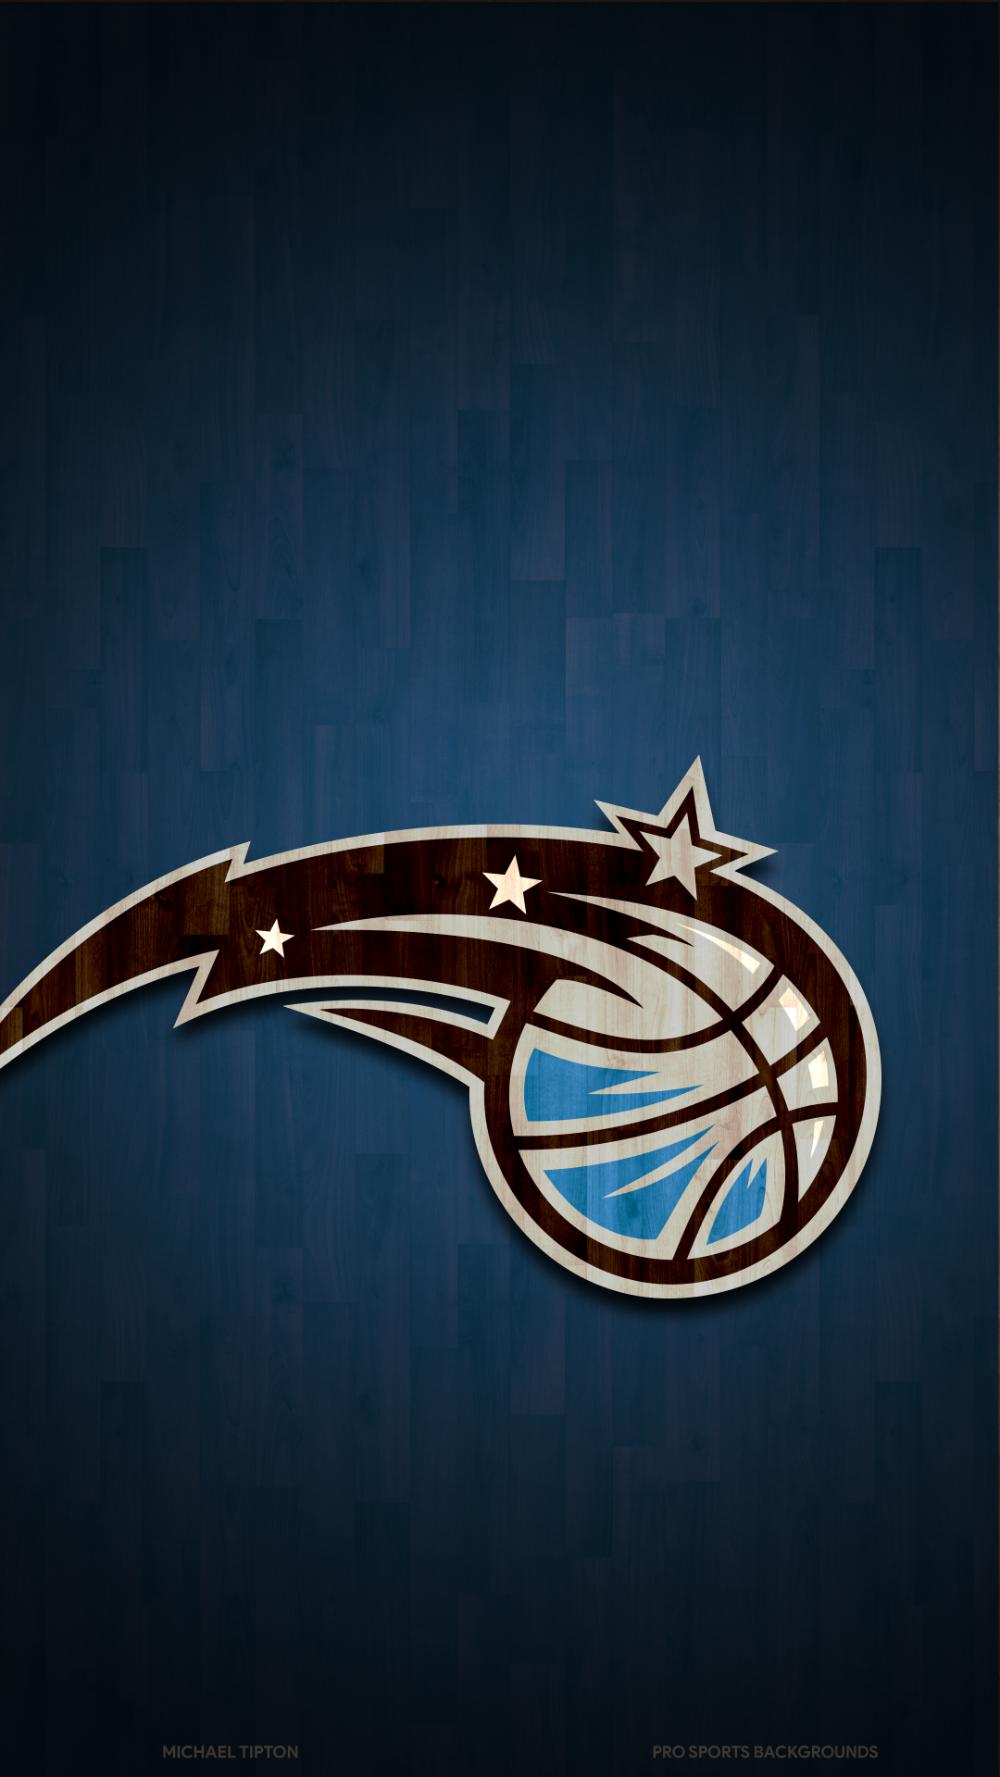 Orlando Magic Wallpapers Pro Sports Backgrounds Orlando Magic Nba Basketball Art Nba Wallpapers